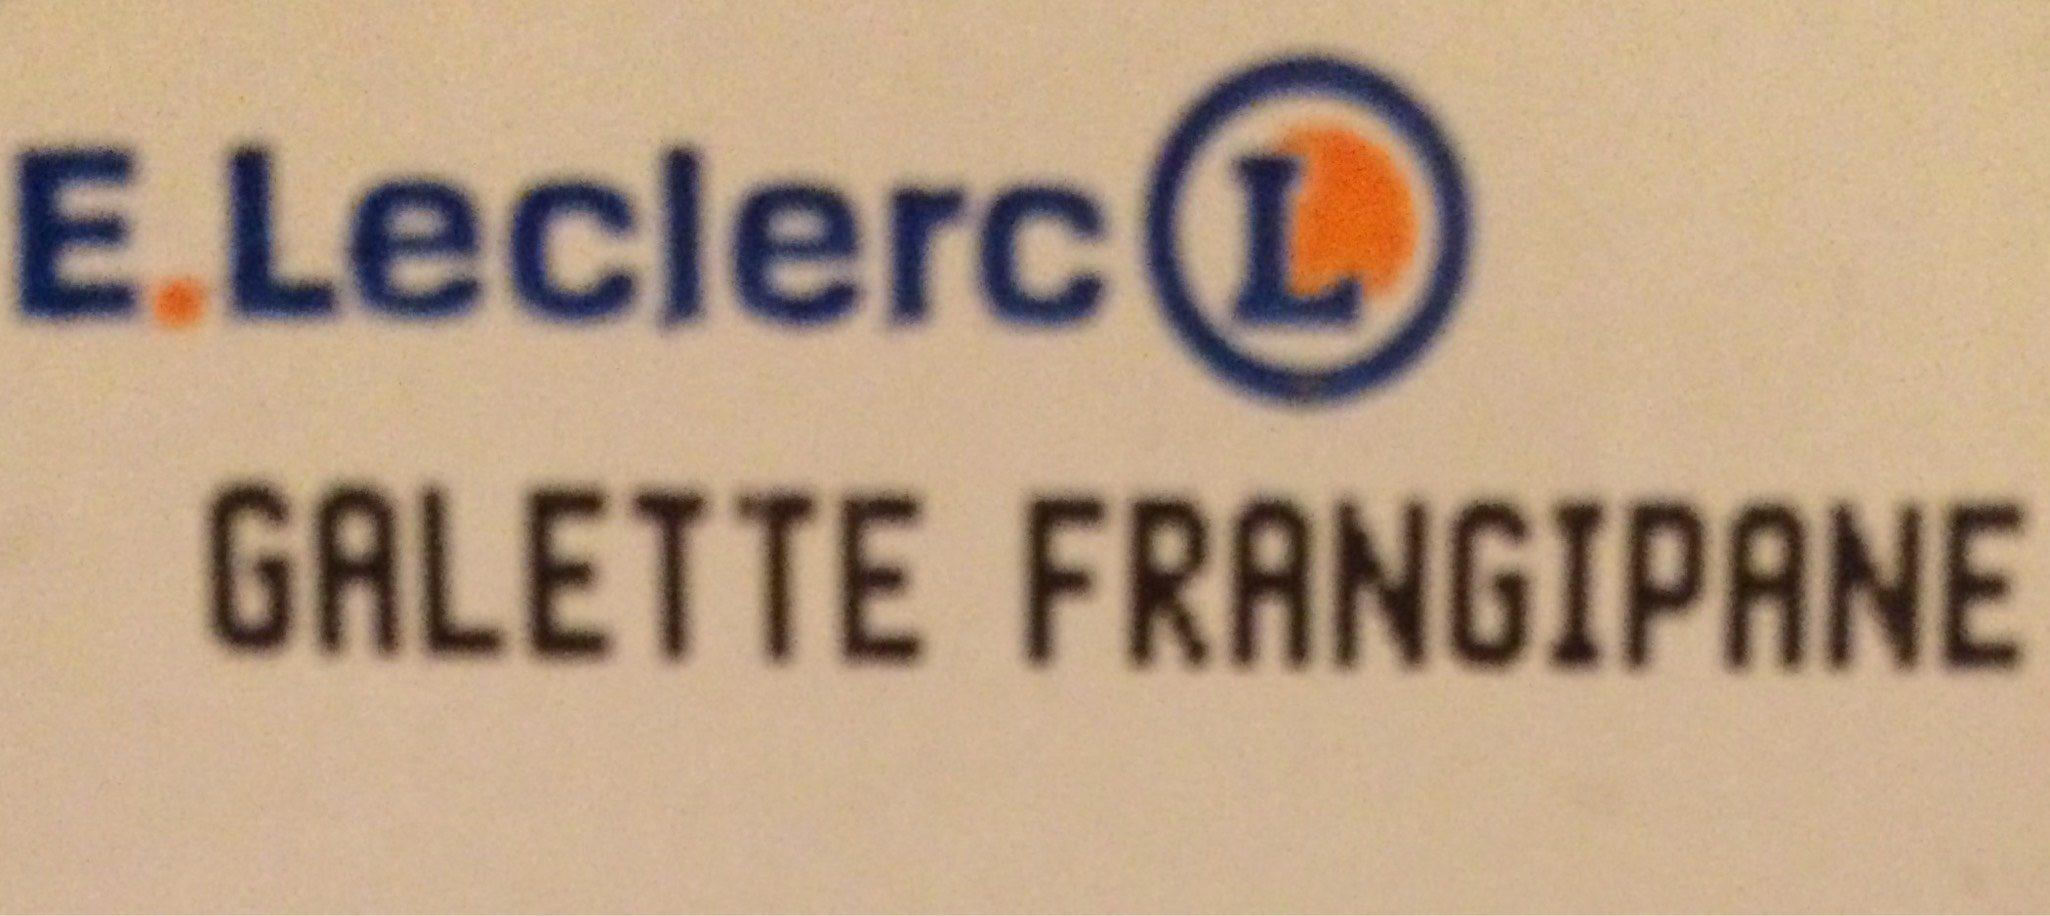 Galette Frangipane Indiv. - Produit - fr